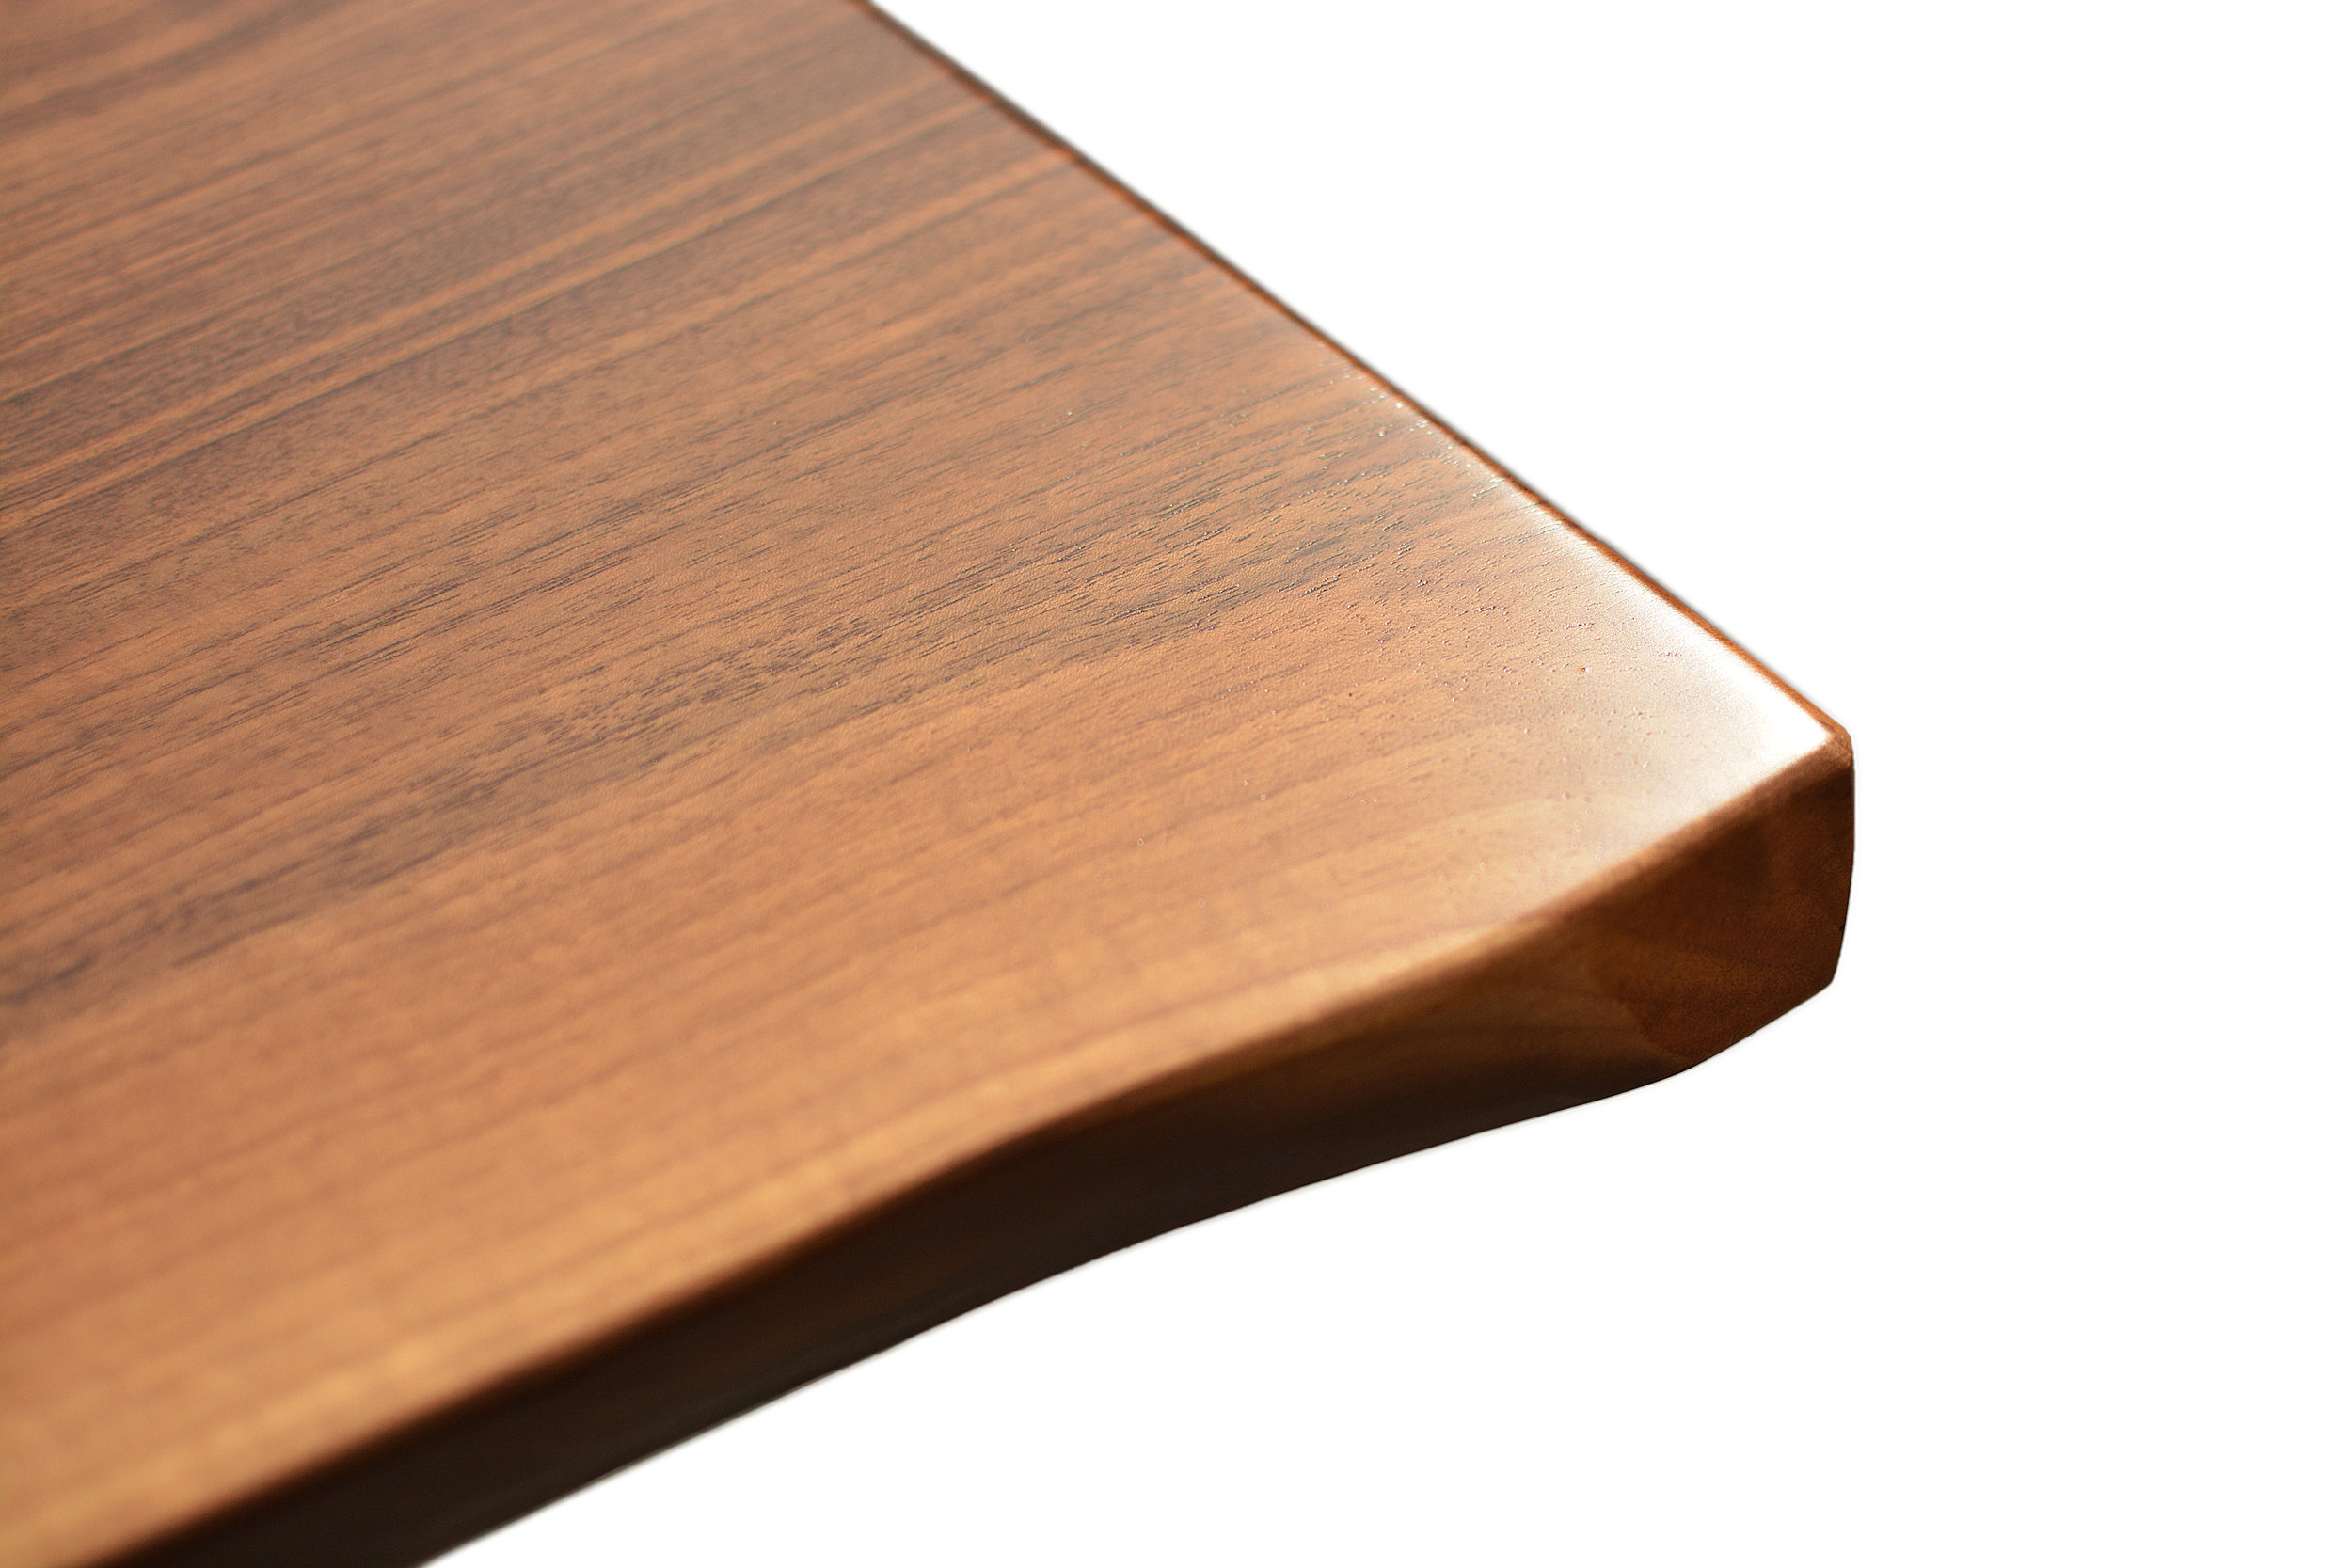 Etz & Steel Hermes Live Edge Walnut Table Close Up 5.JPG